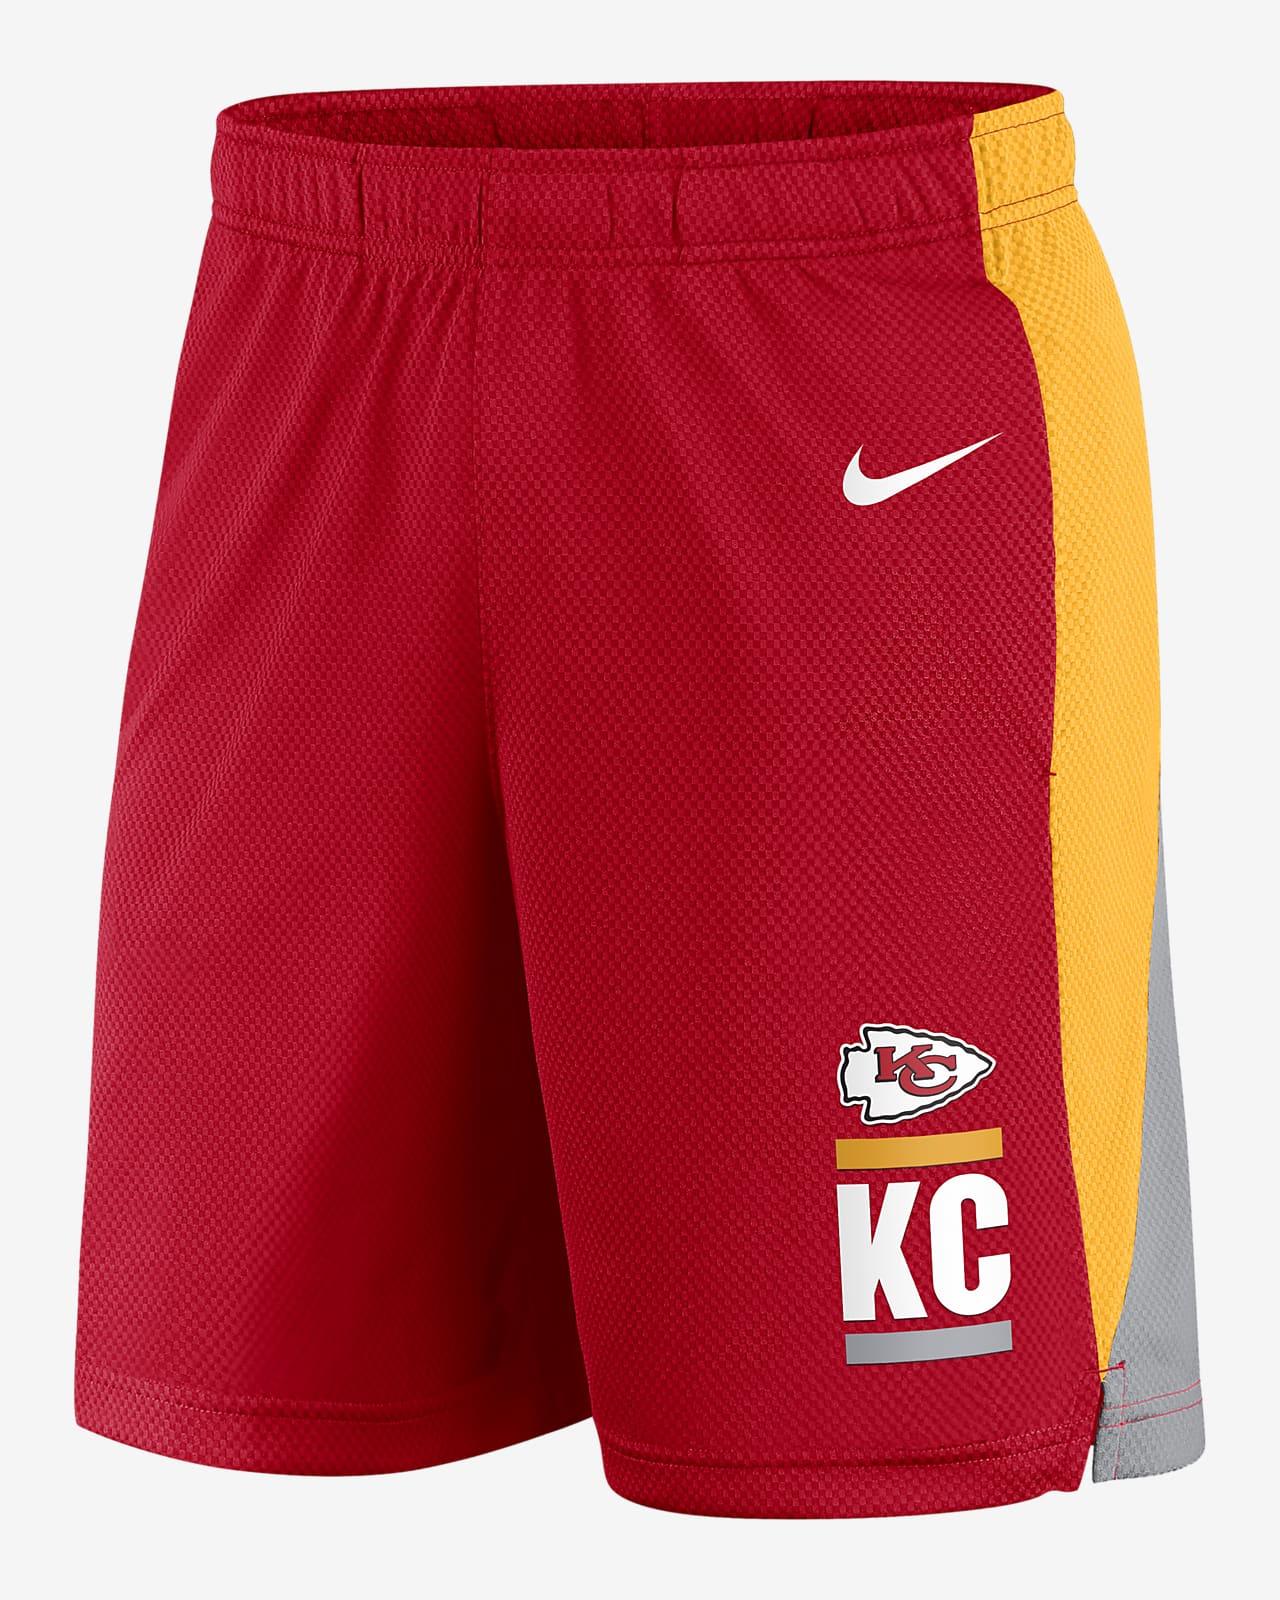 Nike Dri-FIT Broadcast (NFL Kansas City Chiefs) Men's Shorts